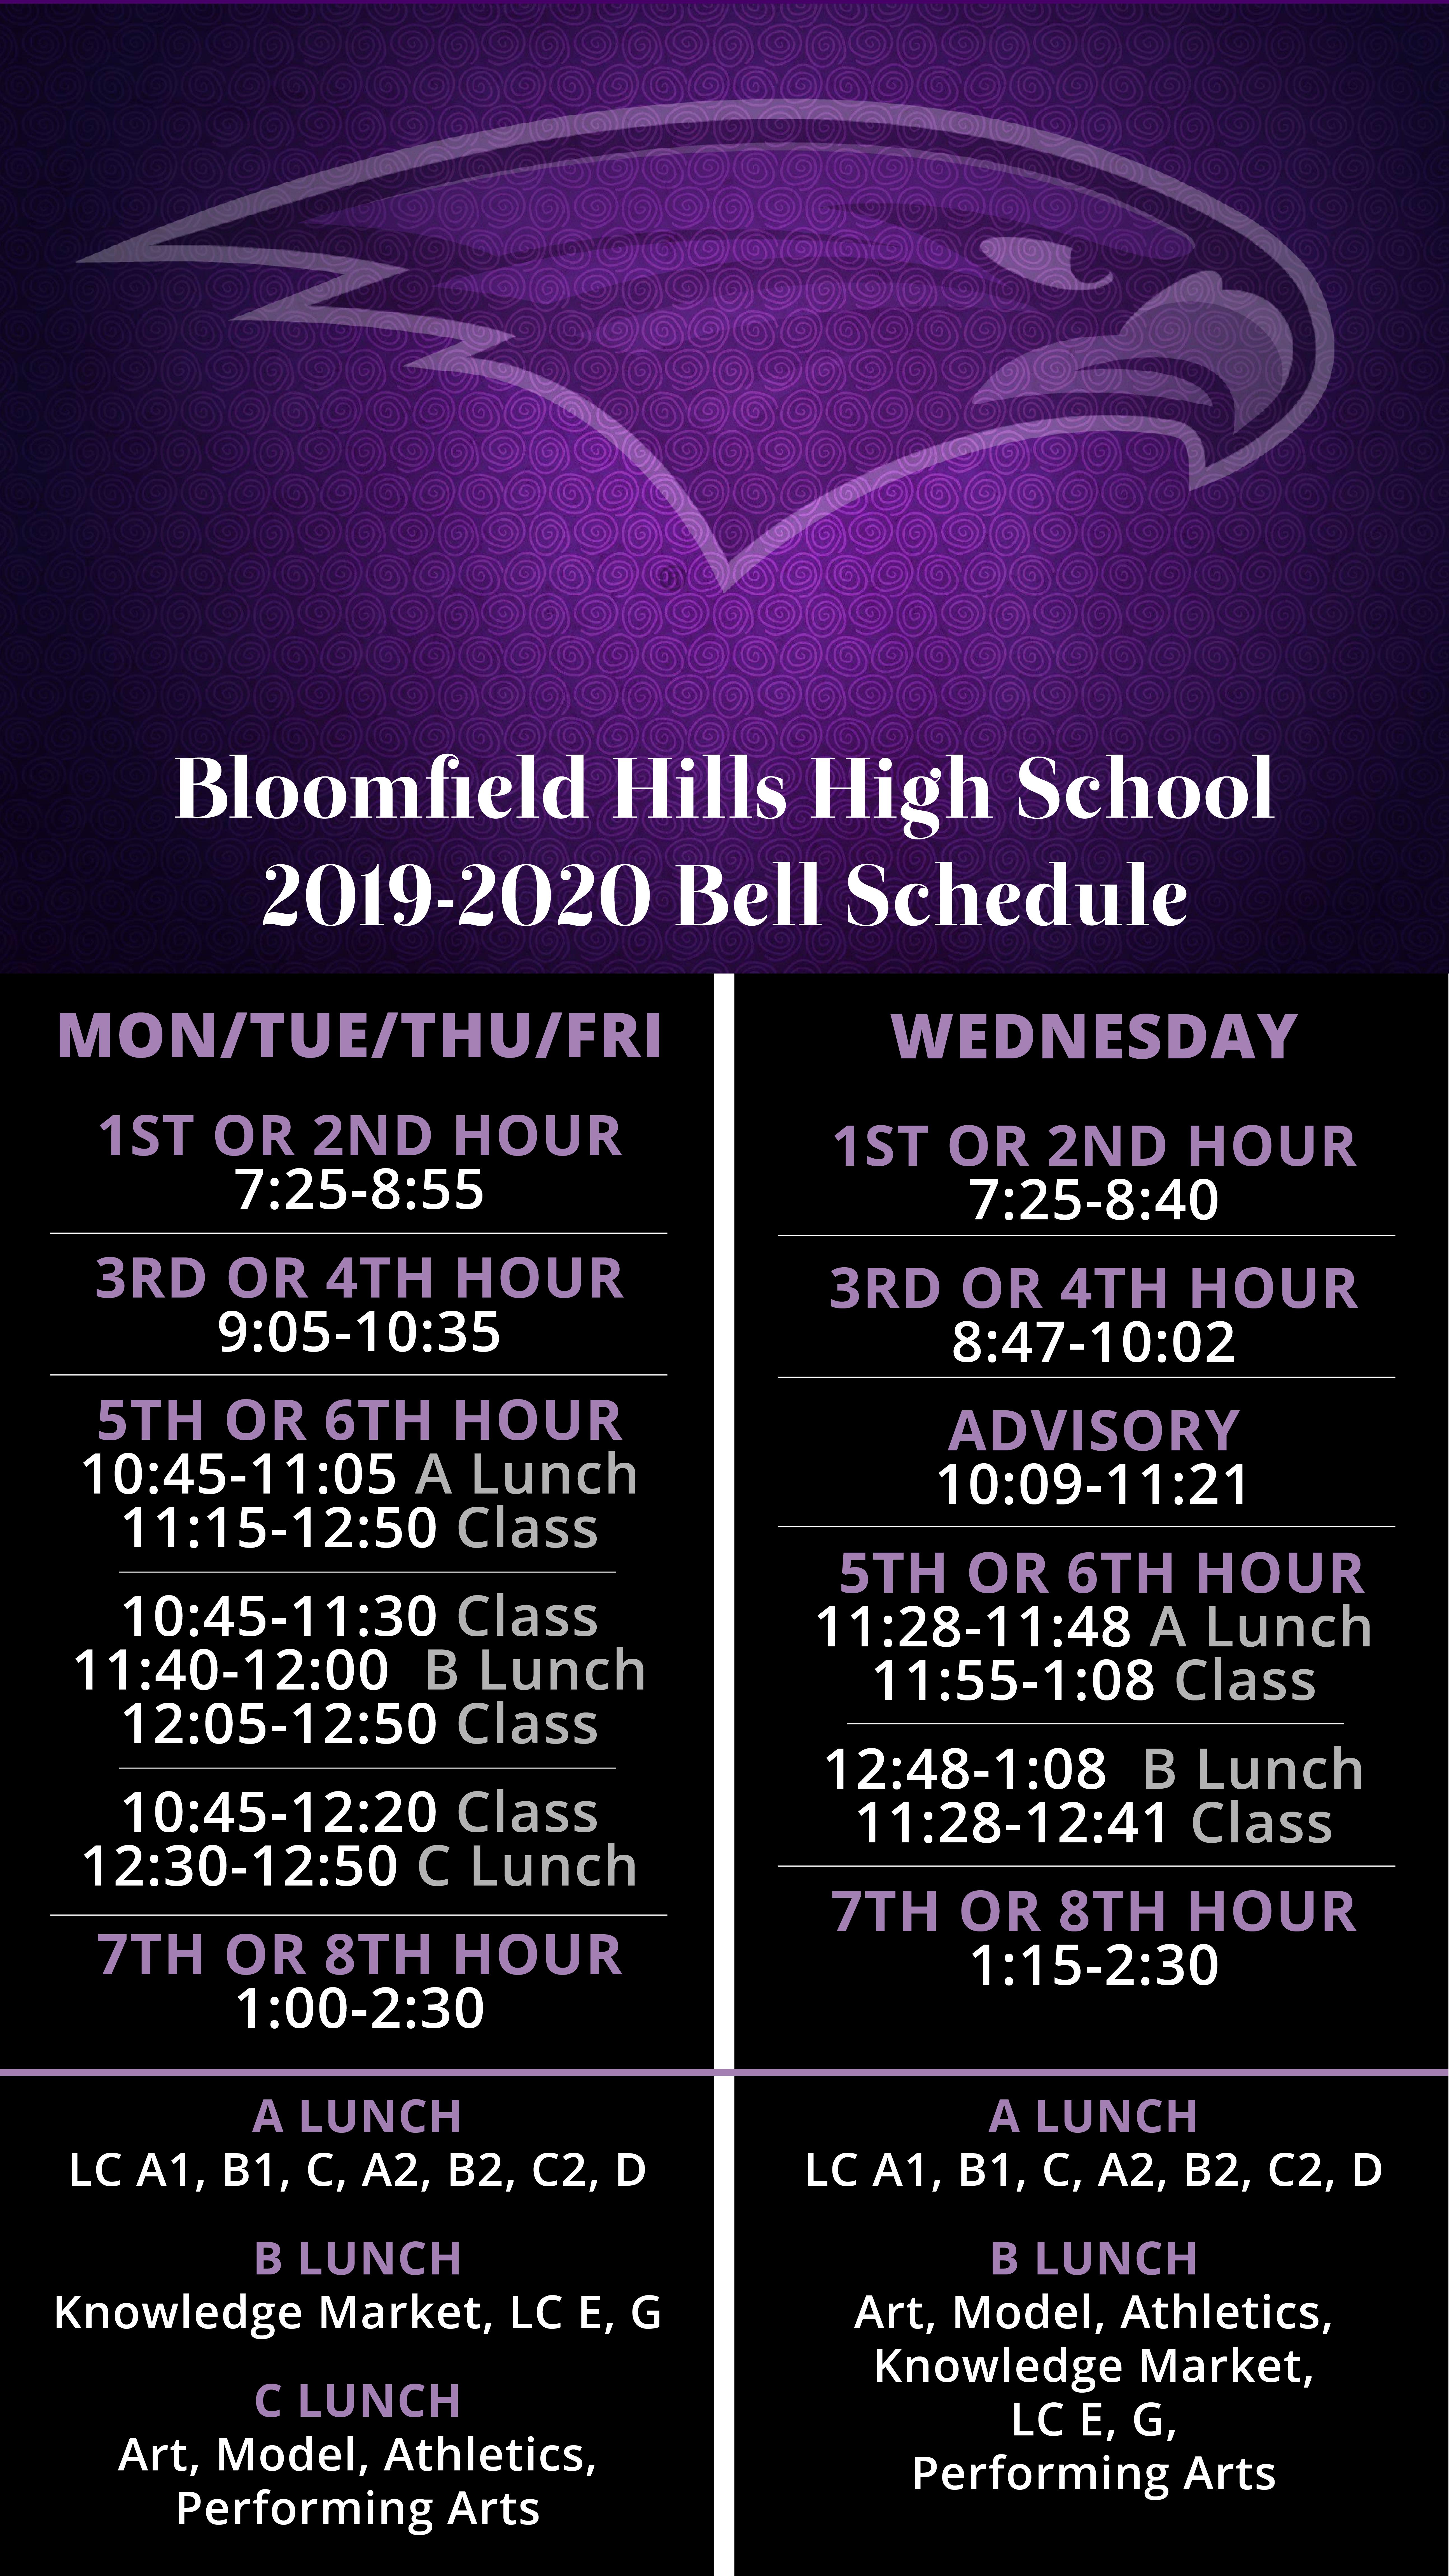 Bloomfield Hills High School | Public High School In Michigan In West Bloomfield High School Calendar 2021